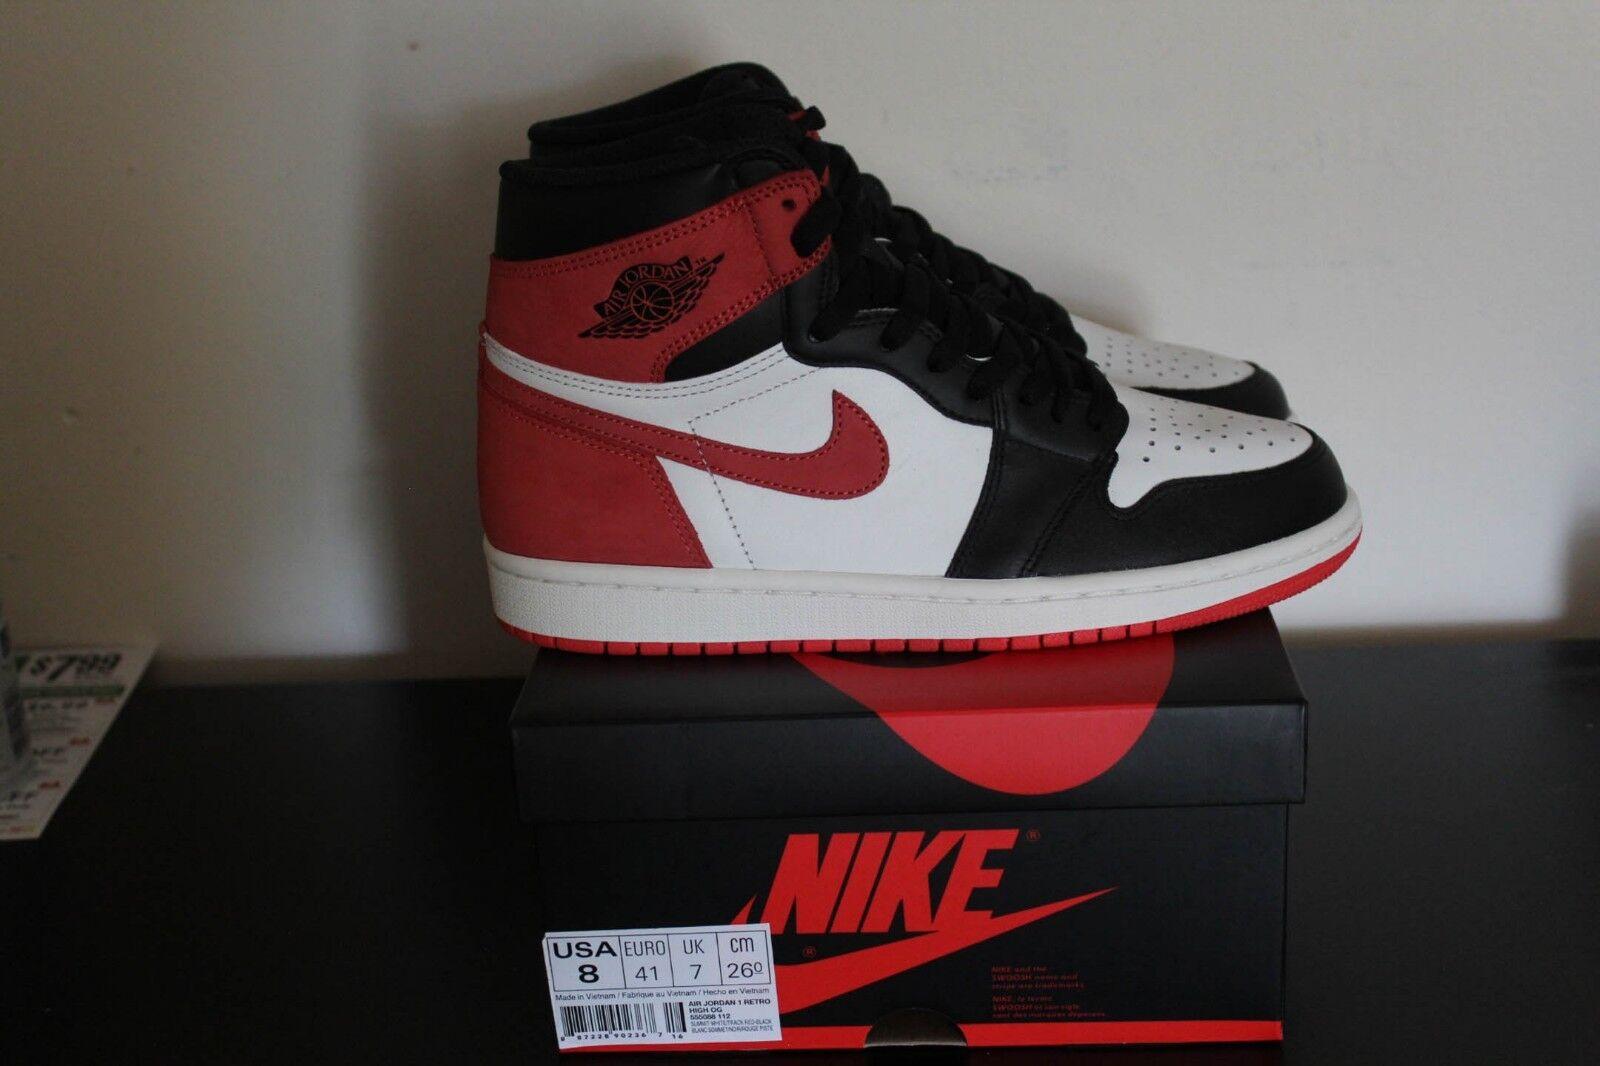 Air Jordan 1 Retro High OG Track Red Size 8